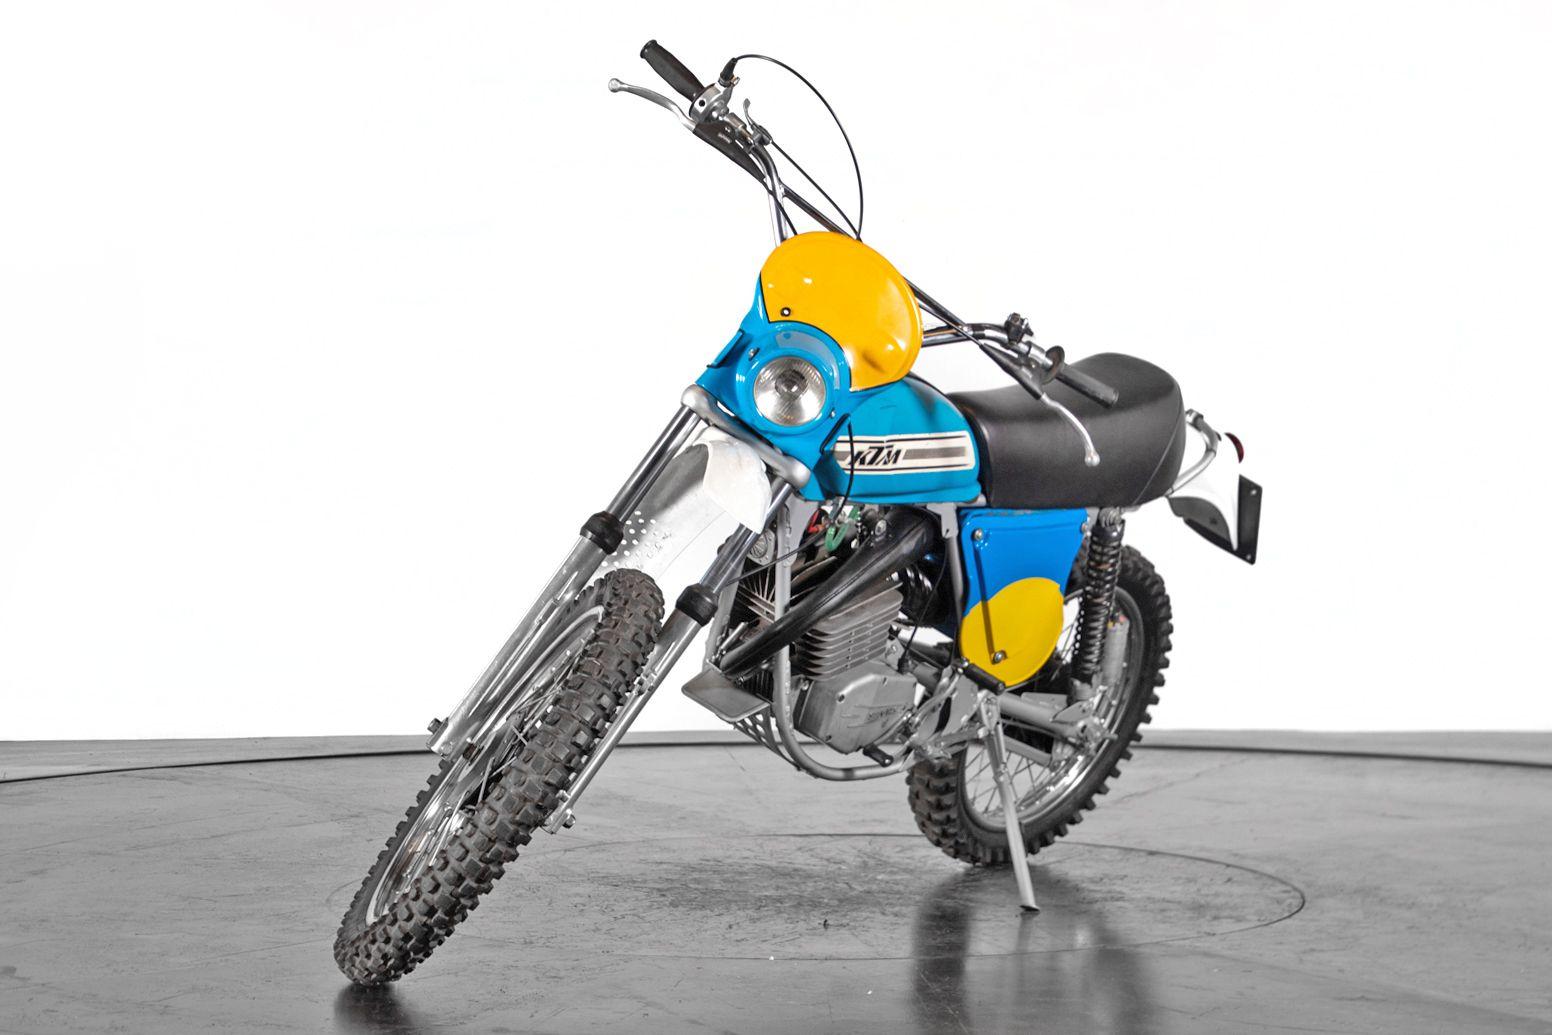 1975 KTM 125 50622